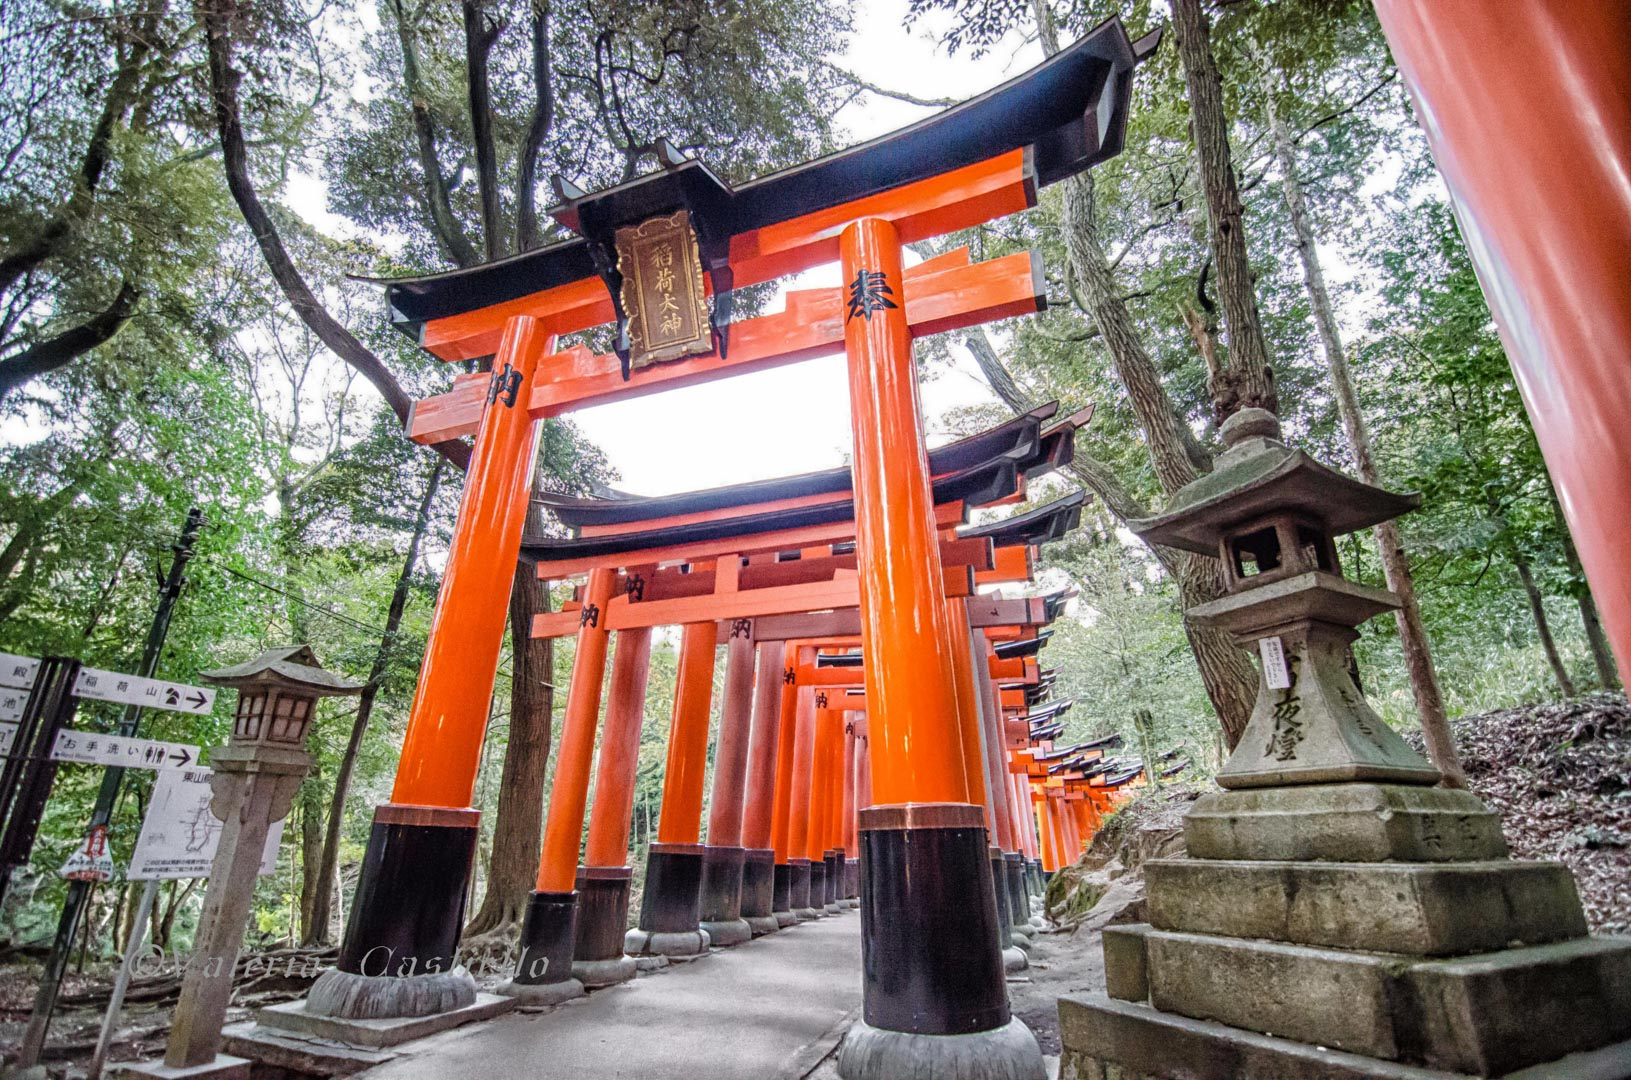 Giappone low cost_Kyoto_Fushimi Inari_wm_mini